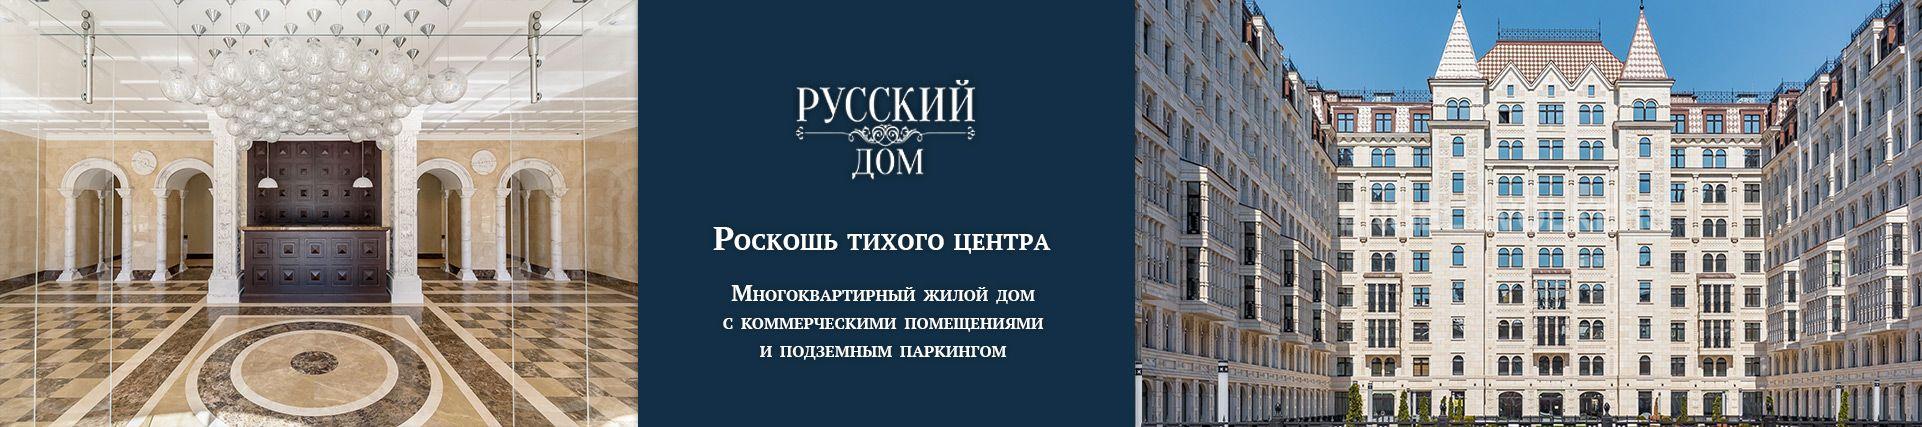 https://evspb.ru/wp-content/uploads/2018/05/ru-sl2-banner-top-russinHouse22.jpg